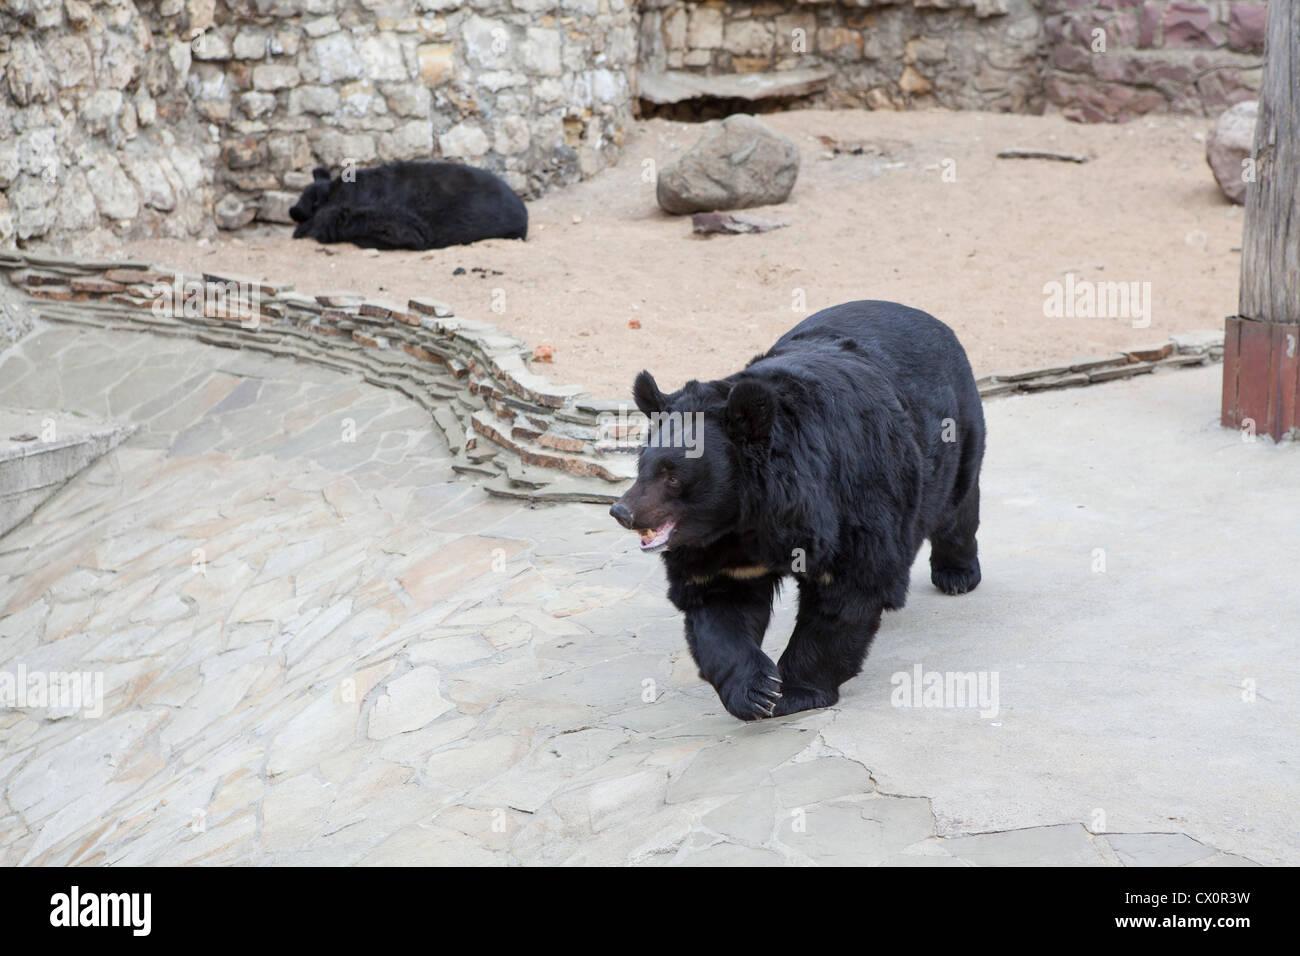 Ussuri Whitechest (Himalayan) bear in the Moscow zoo, Russia. Asian black bear, Ursus thibetanus - Stock Image